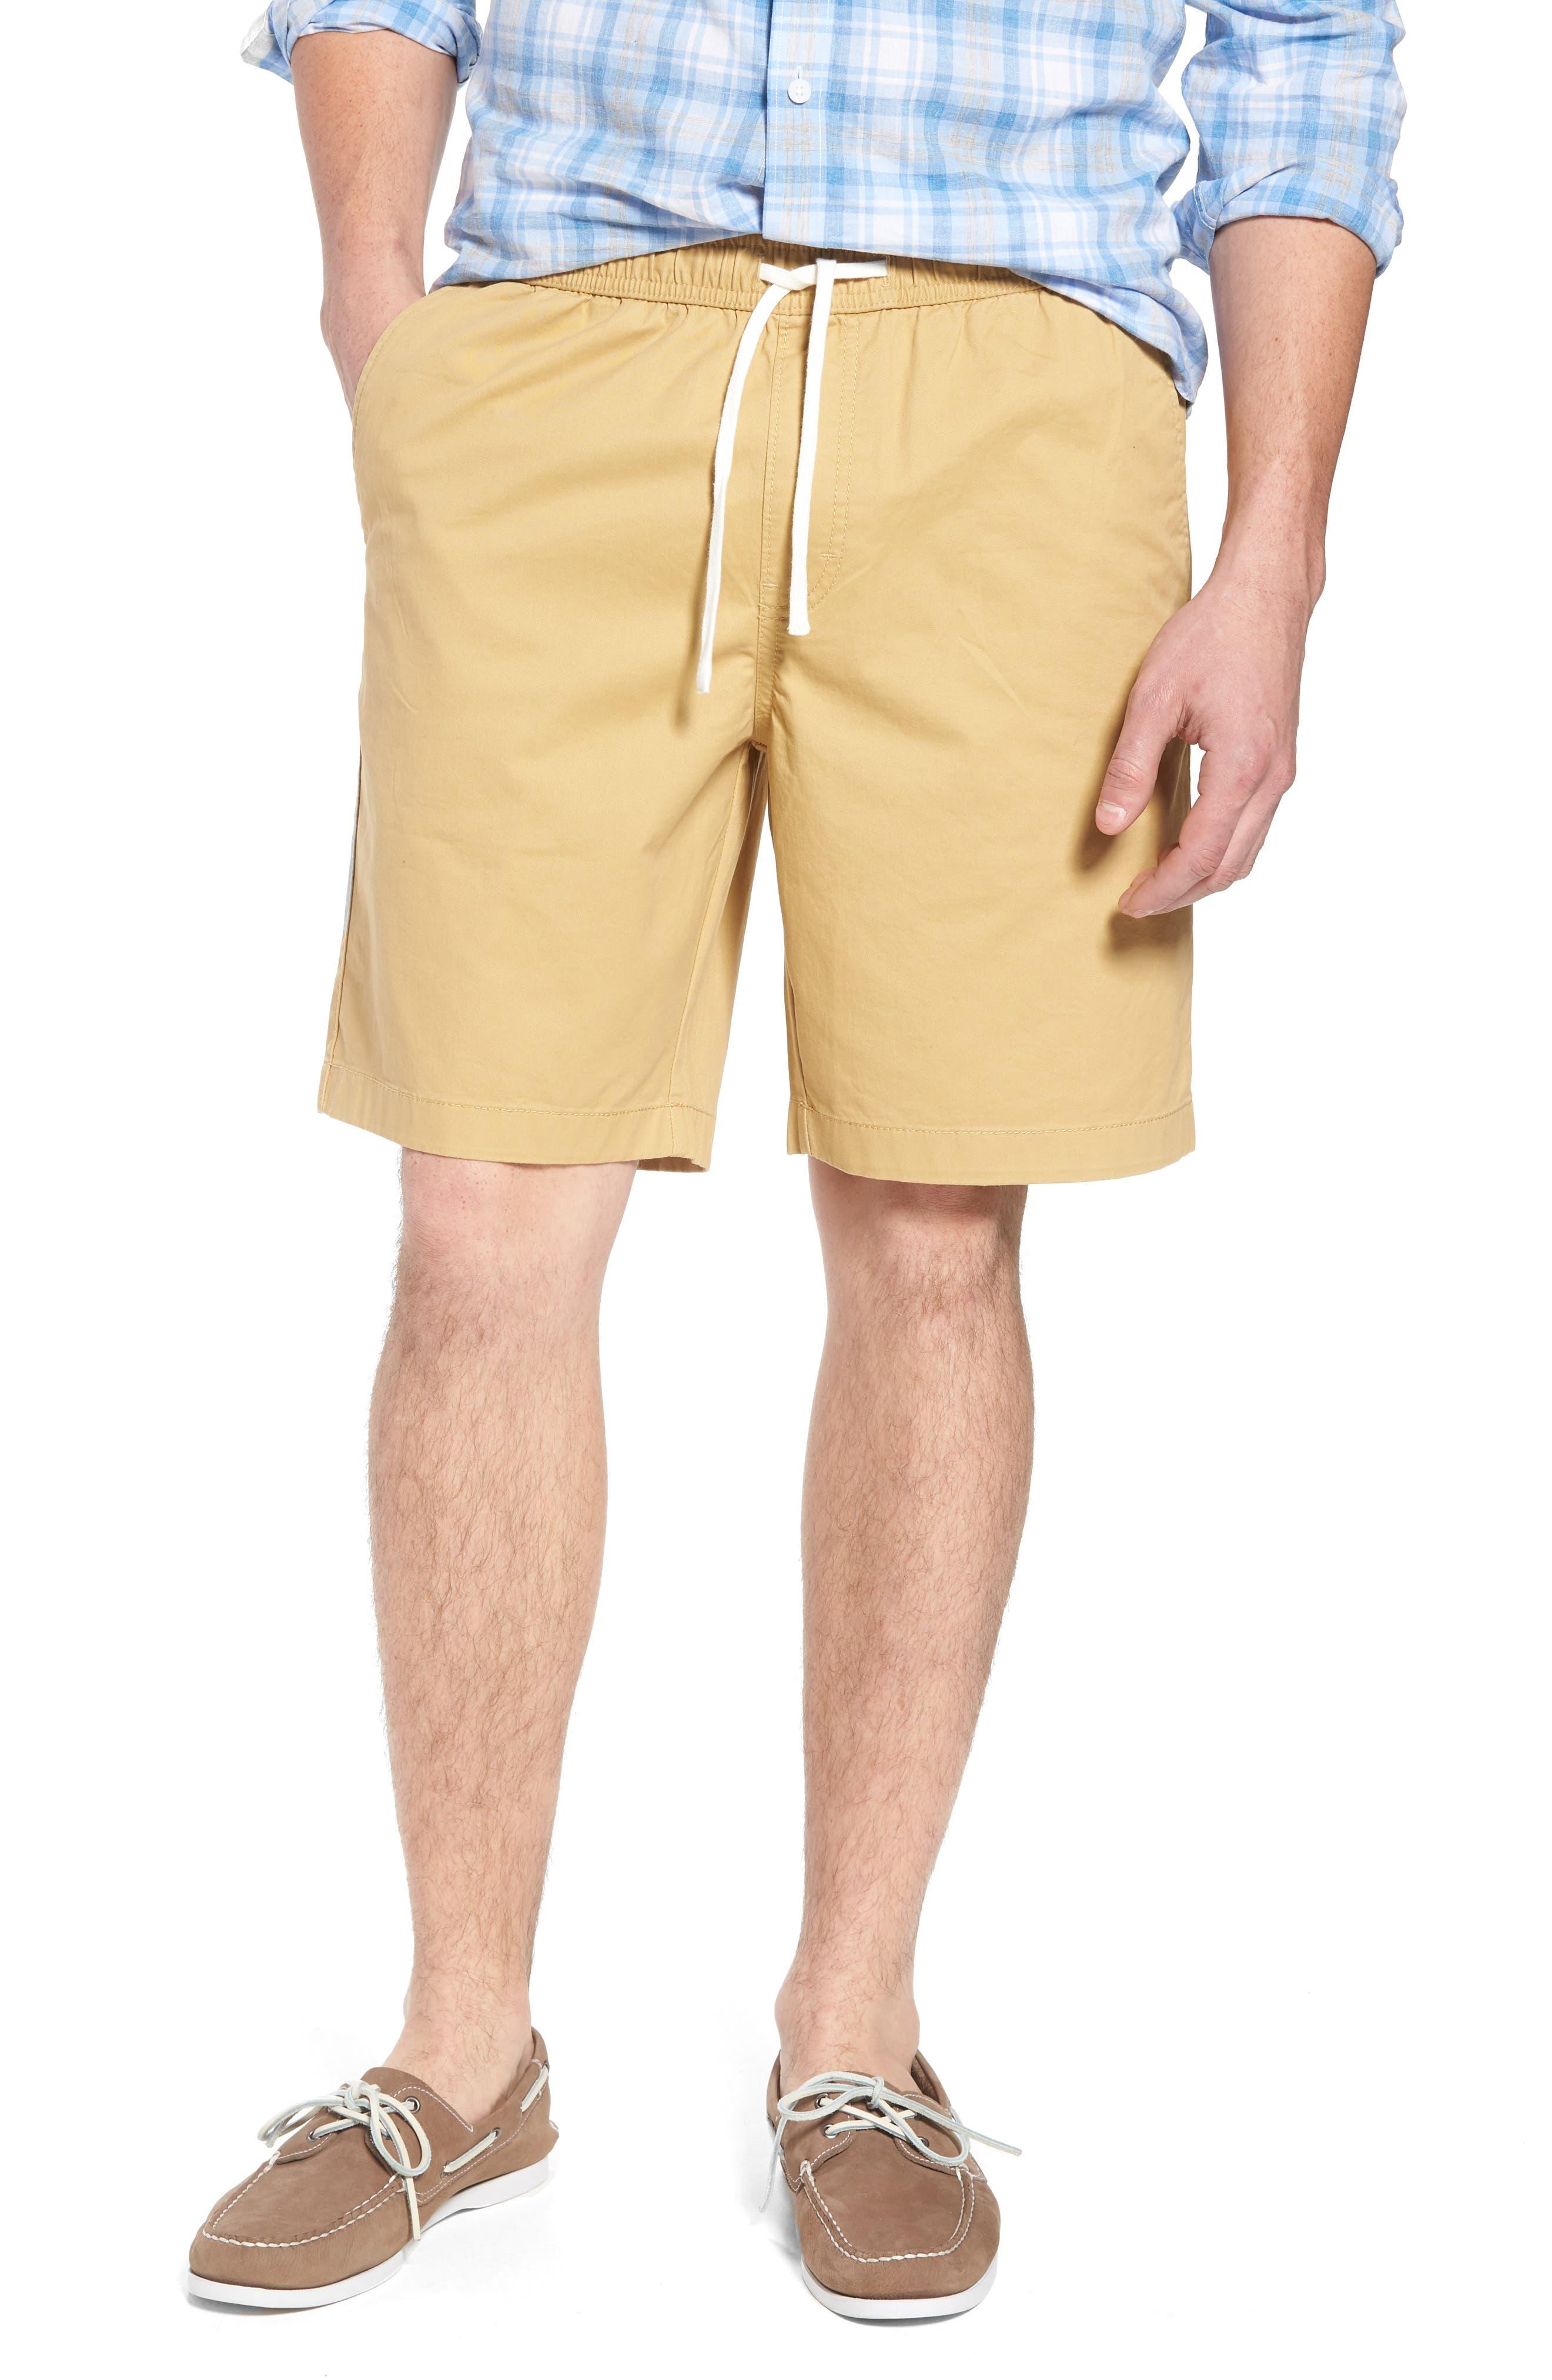 Ballard Slim Fit Shorts,                             Main thumbnail 1, color,                             Tan Lark